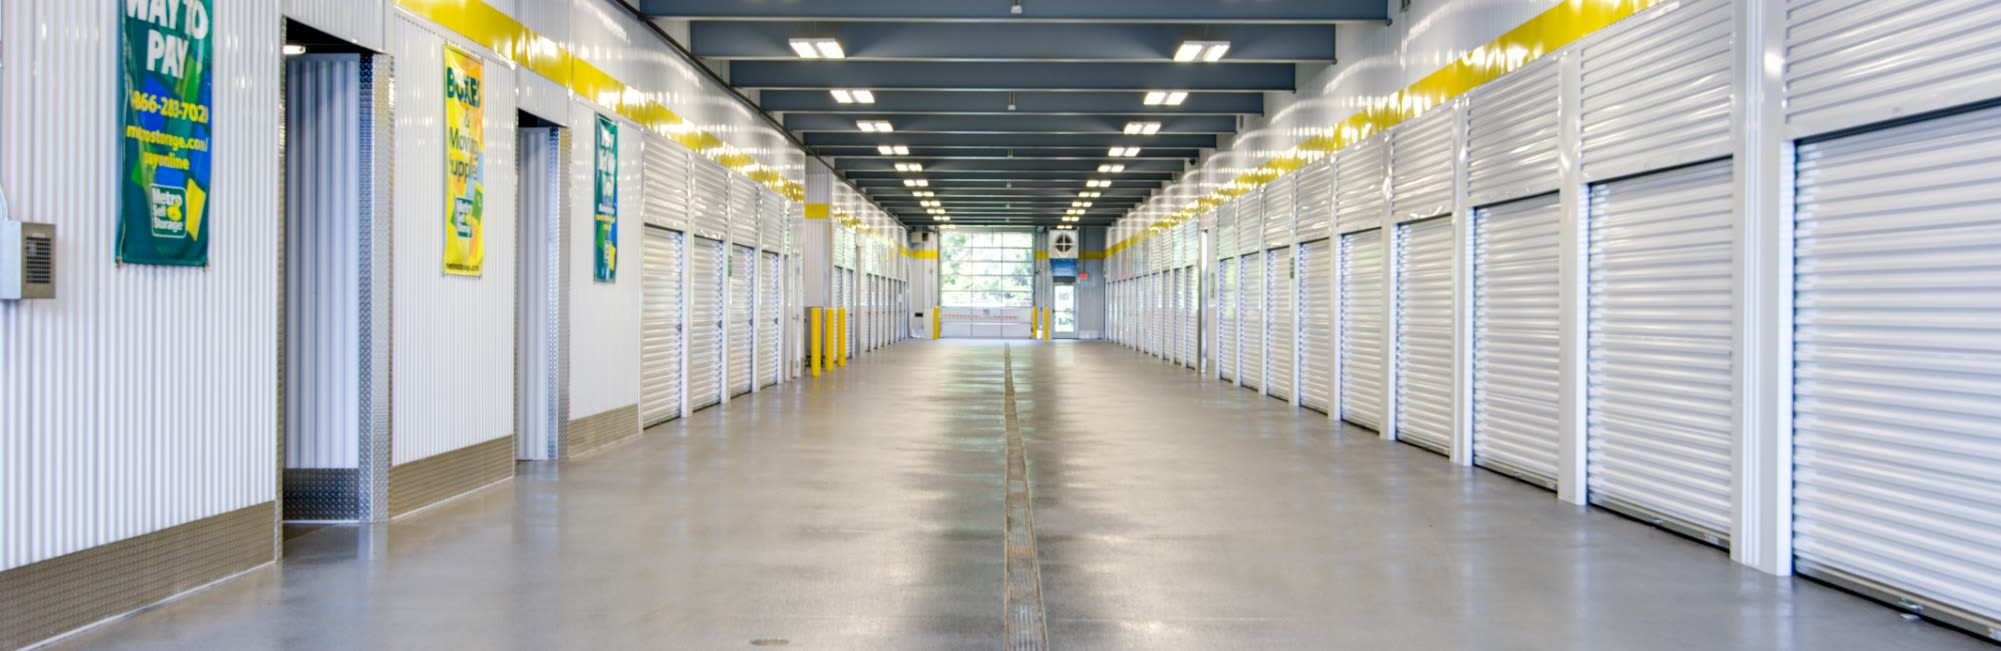 Metro Self Storage in Coon Rapids, Minnesota